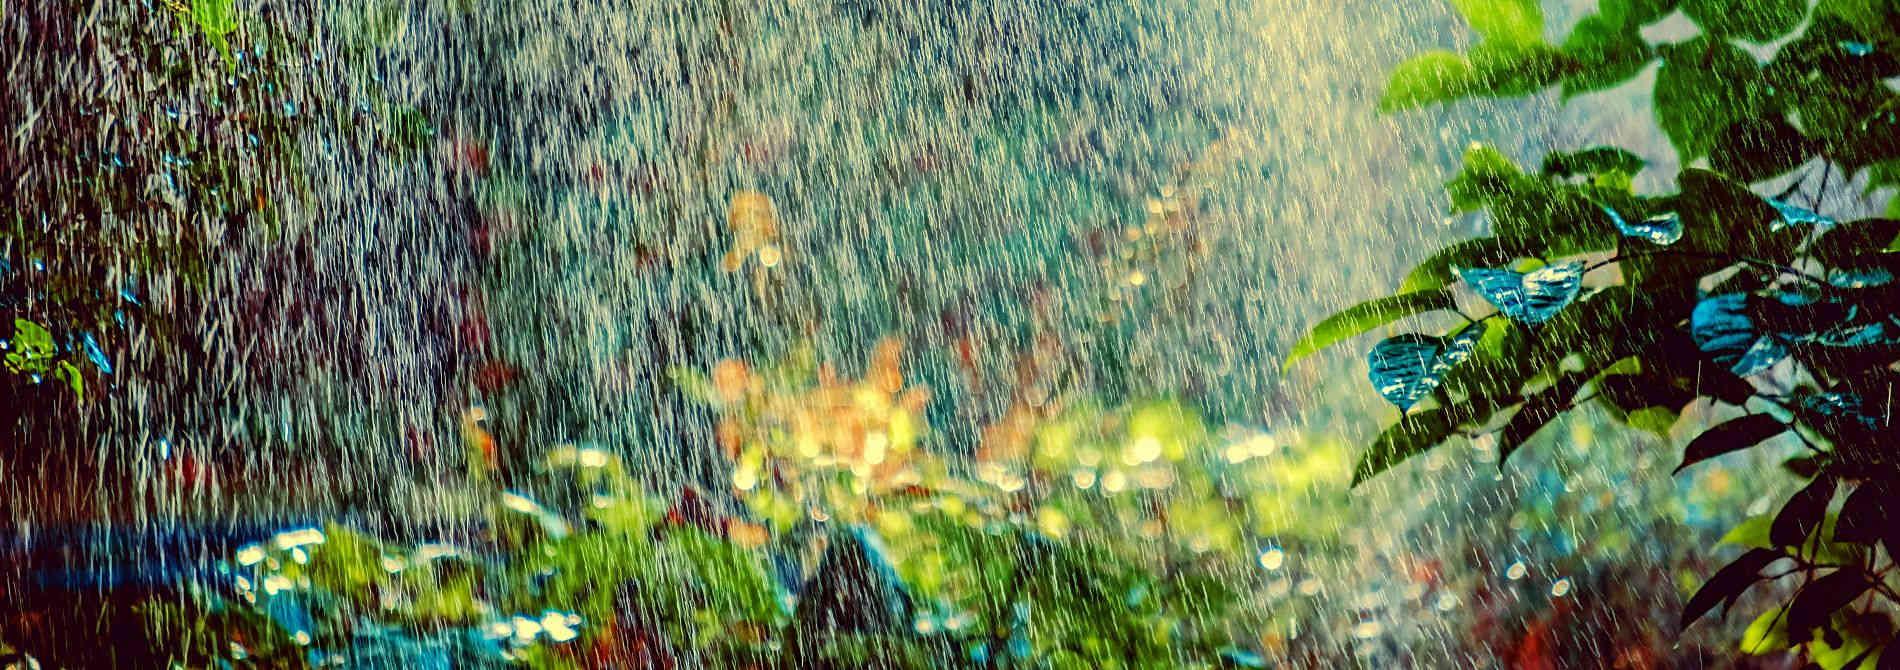 Full Size of Bewässerungssystem Garten Dvs Beregnung Beste Bewsserung Fr Ihren Rattenbekämpfung Im Spaten Gerätehaus Bewässerung Sichtschutz Holz Mein Schöner Abo Garten Bewässerungssystem Garten